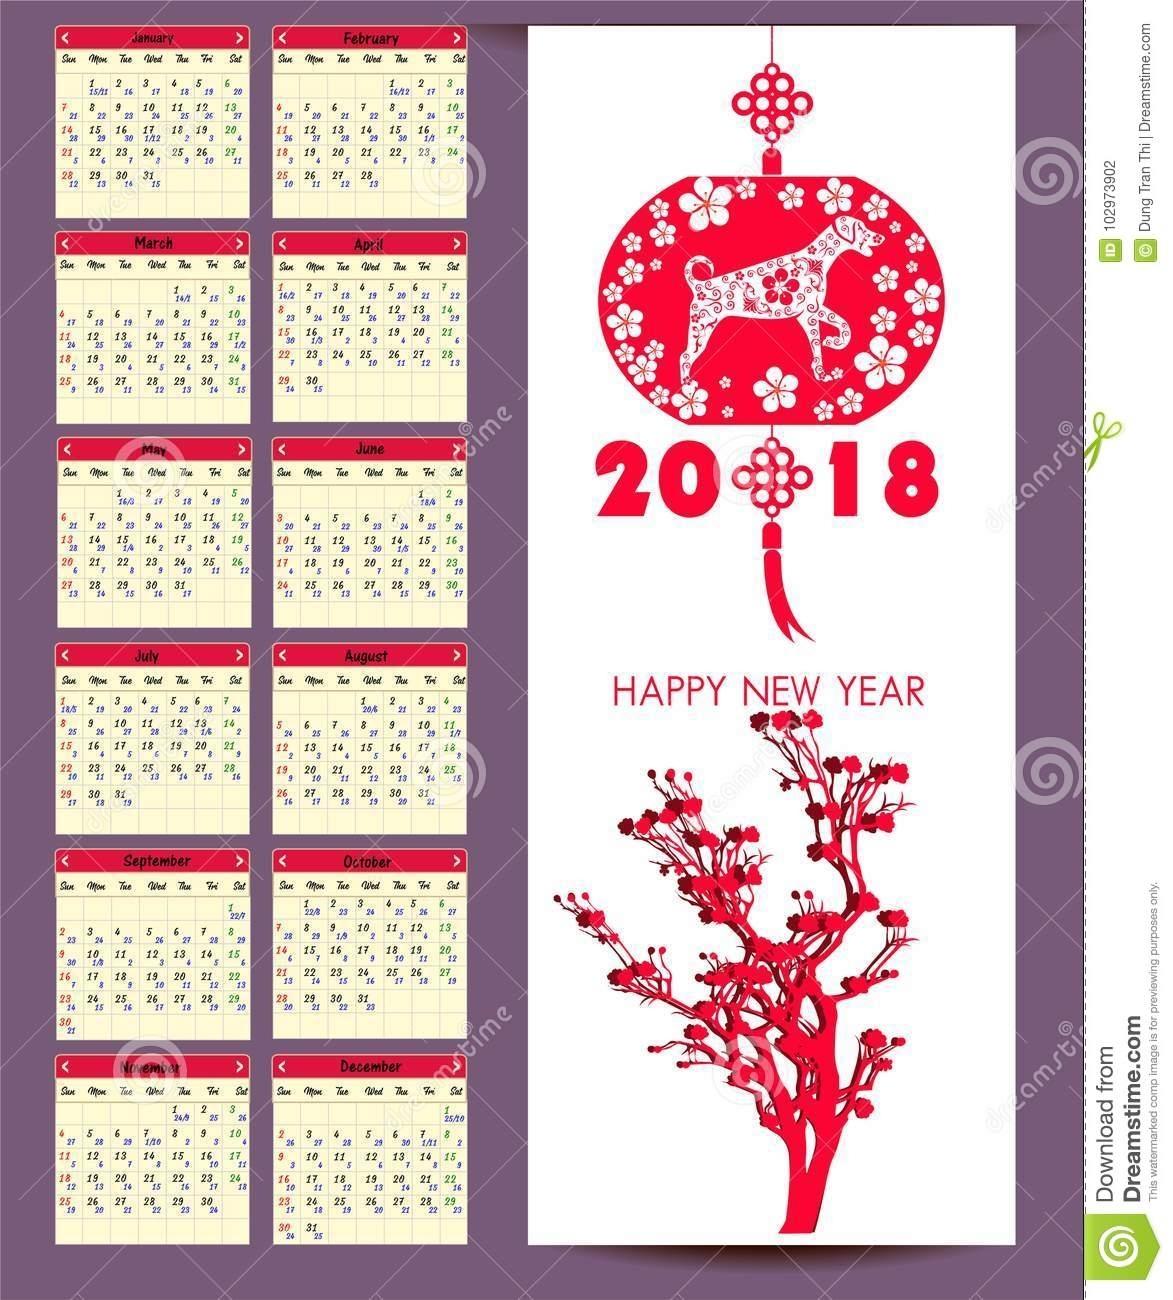 Lunar Calendar, Chinese Calendar For Happy New Year 2018